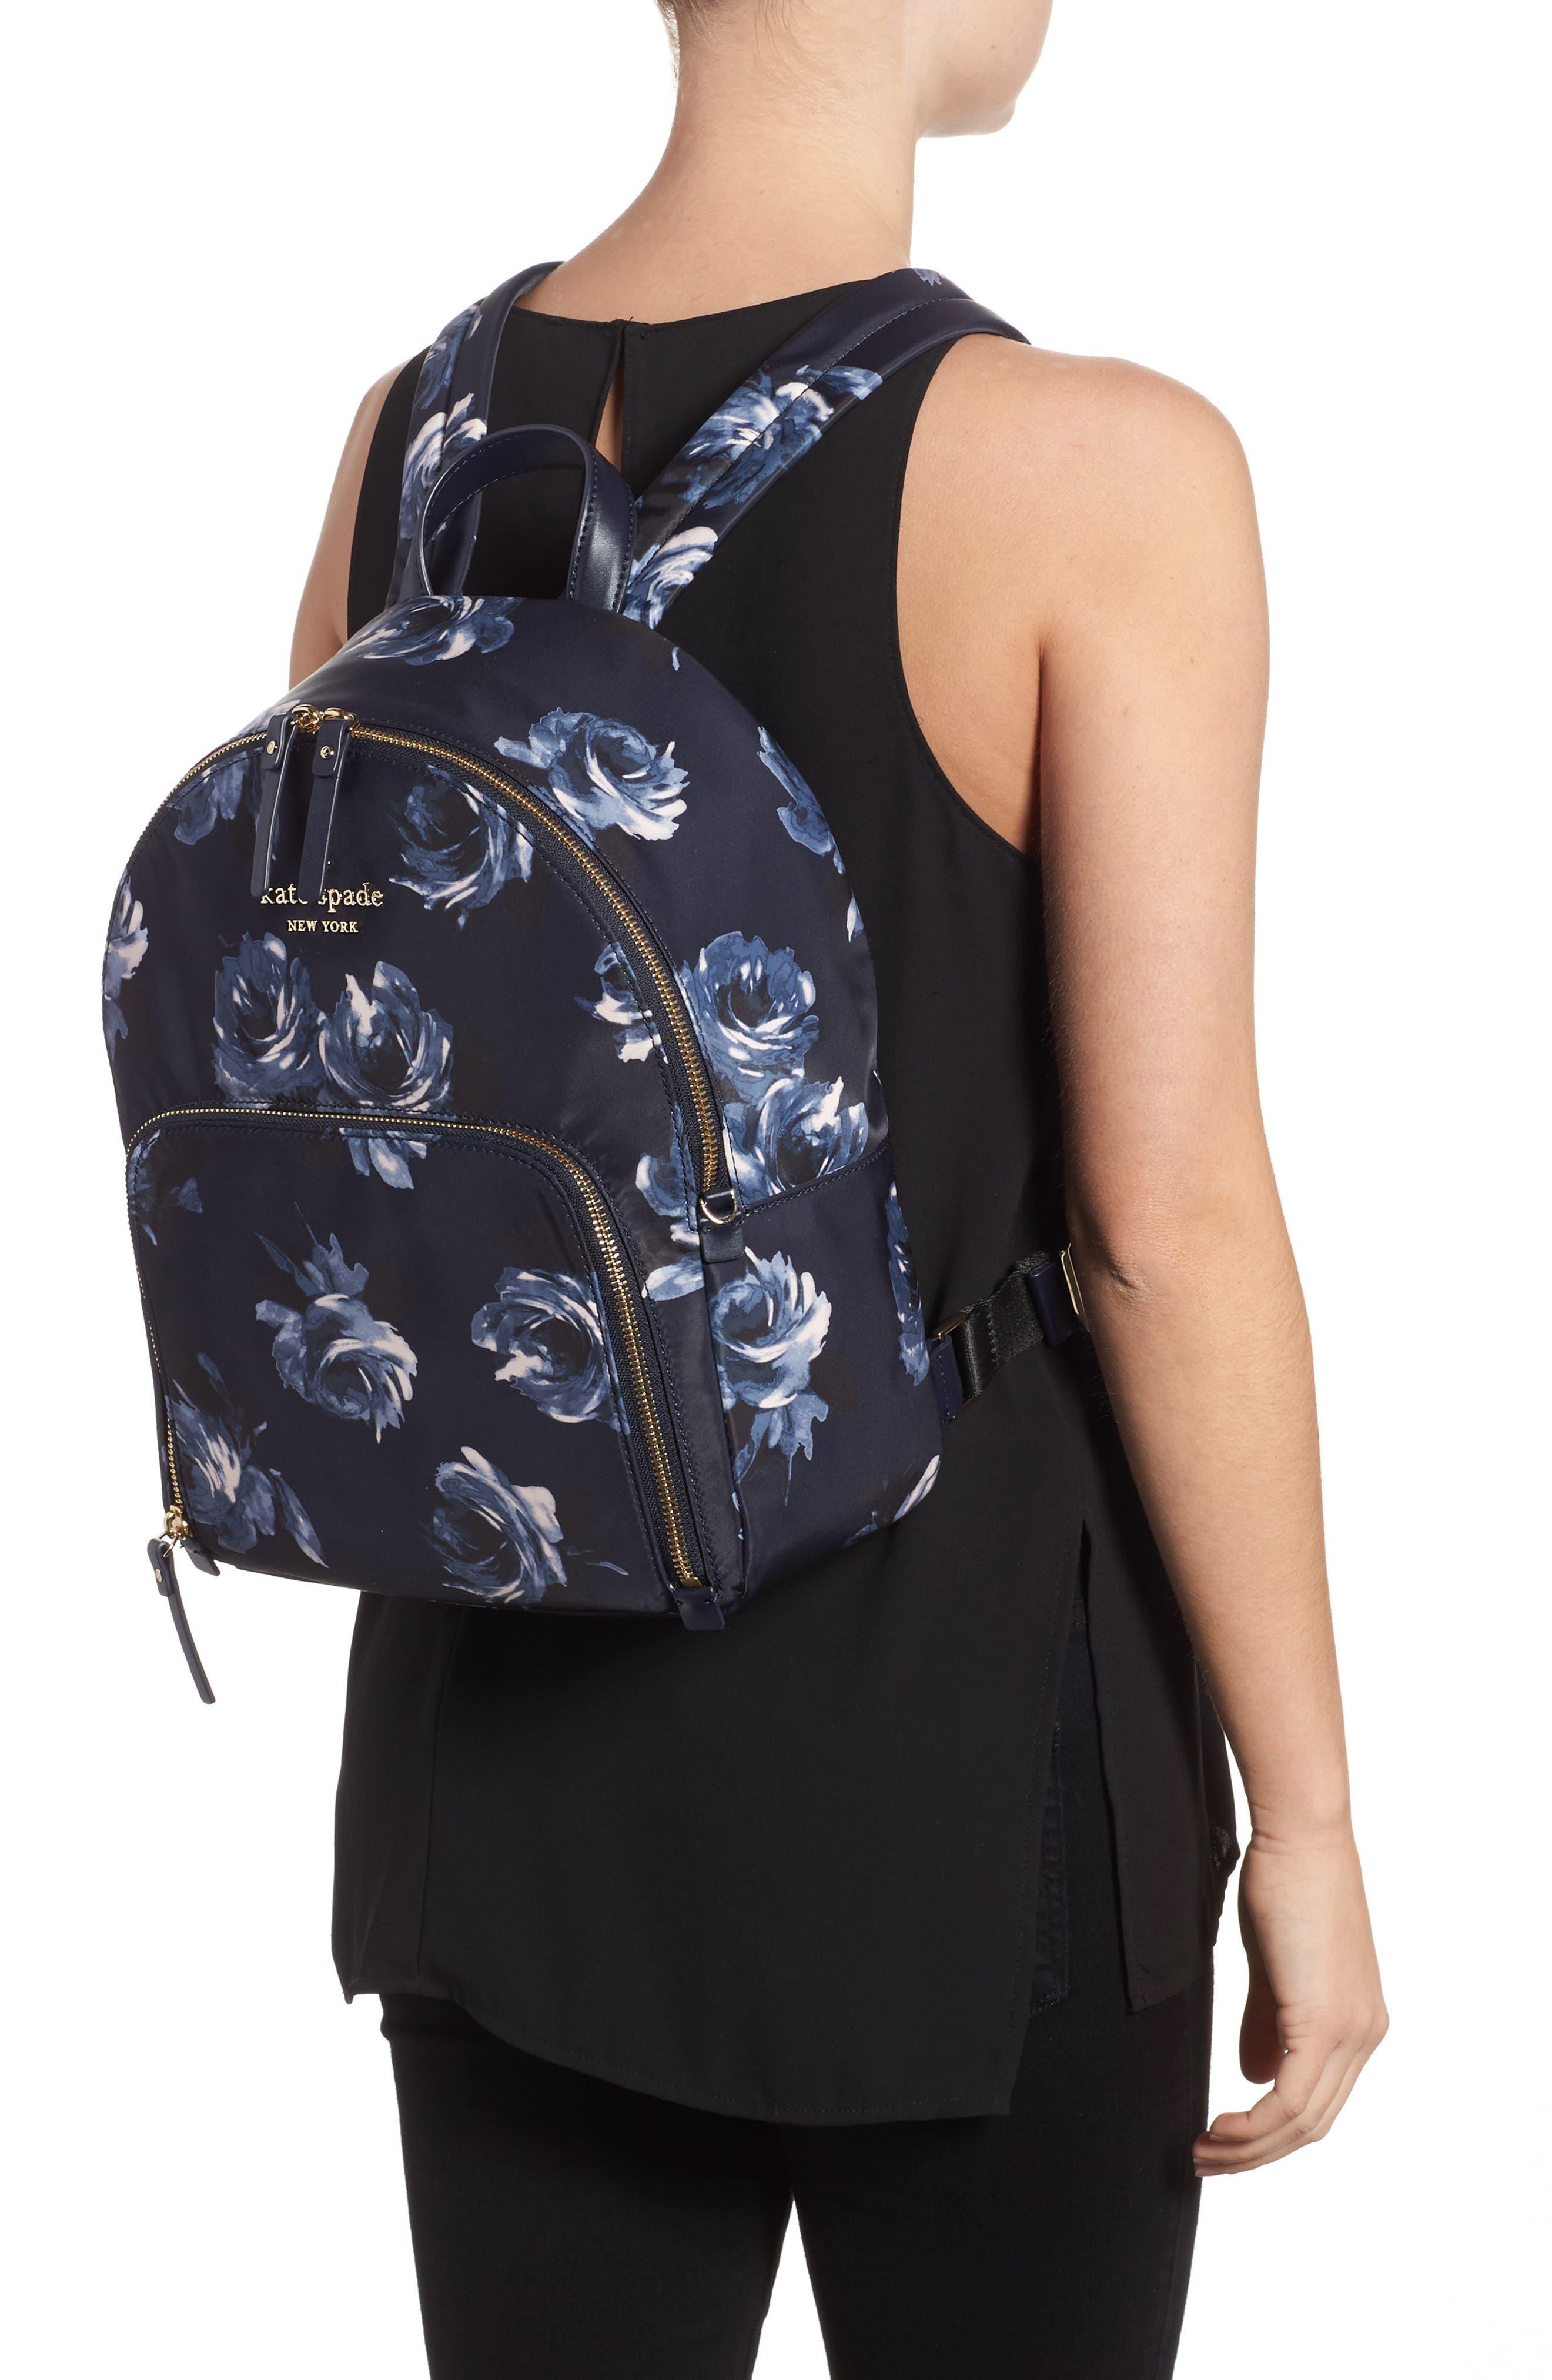 watson lane night rose hartley nylon backpack,                             Alternate thumbnail 2, color,                             Night Rose